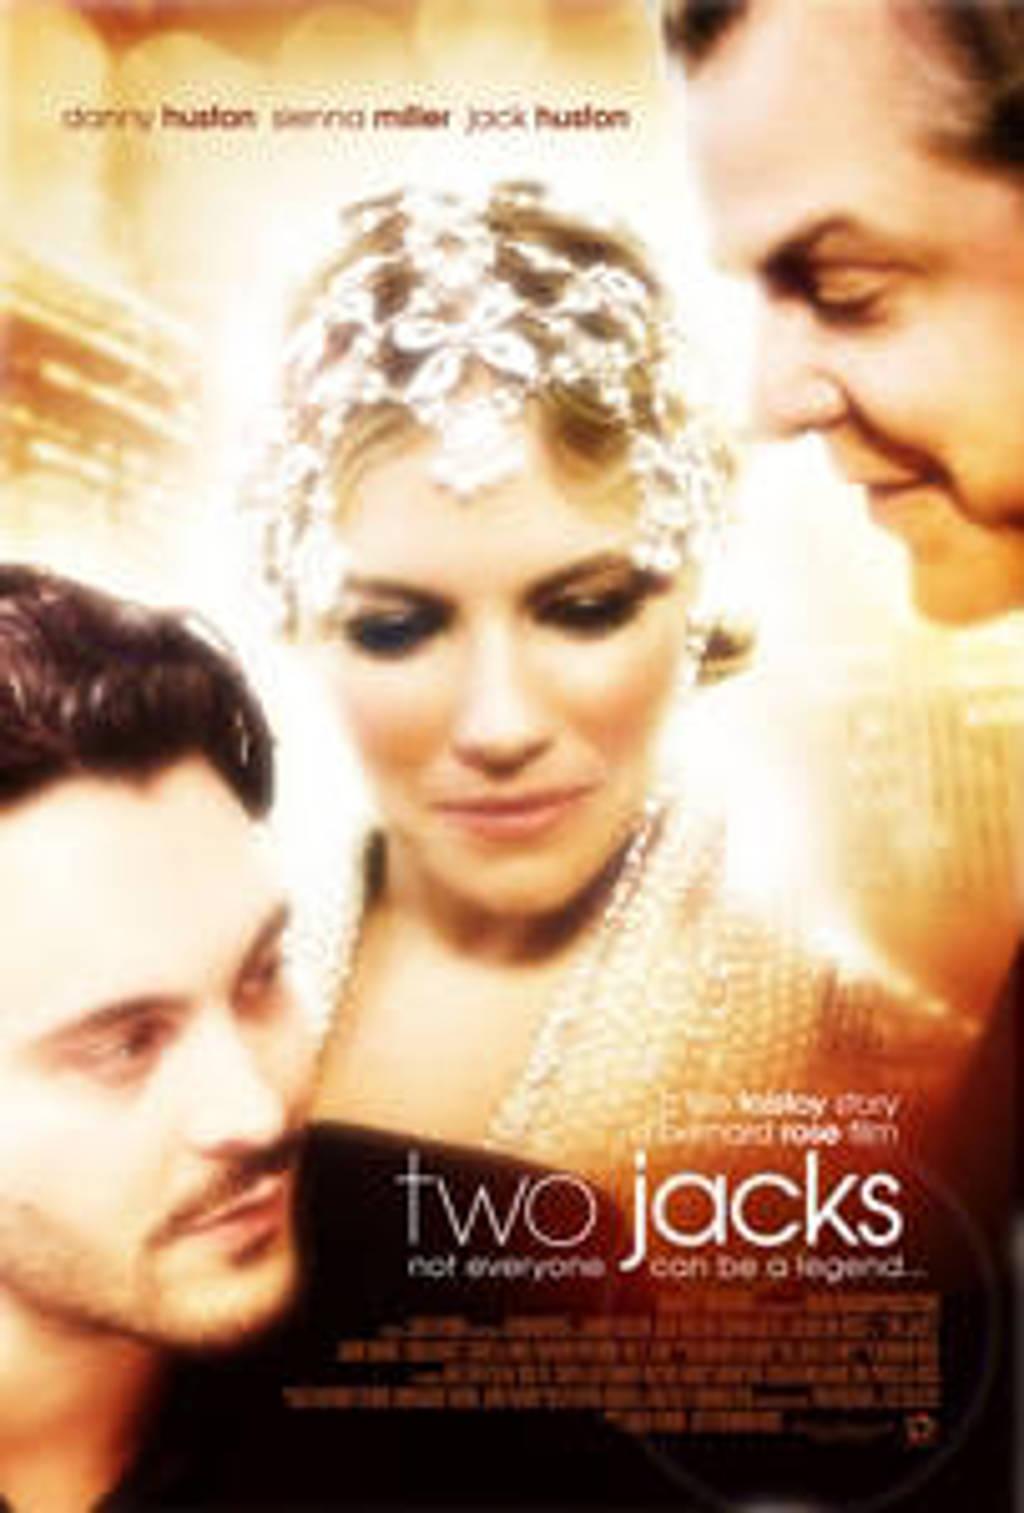 Two jacks (DVD)